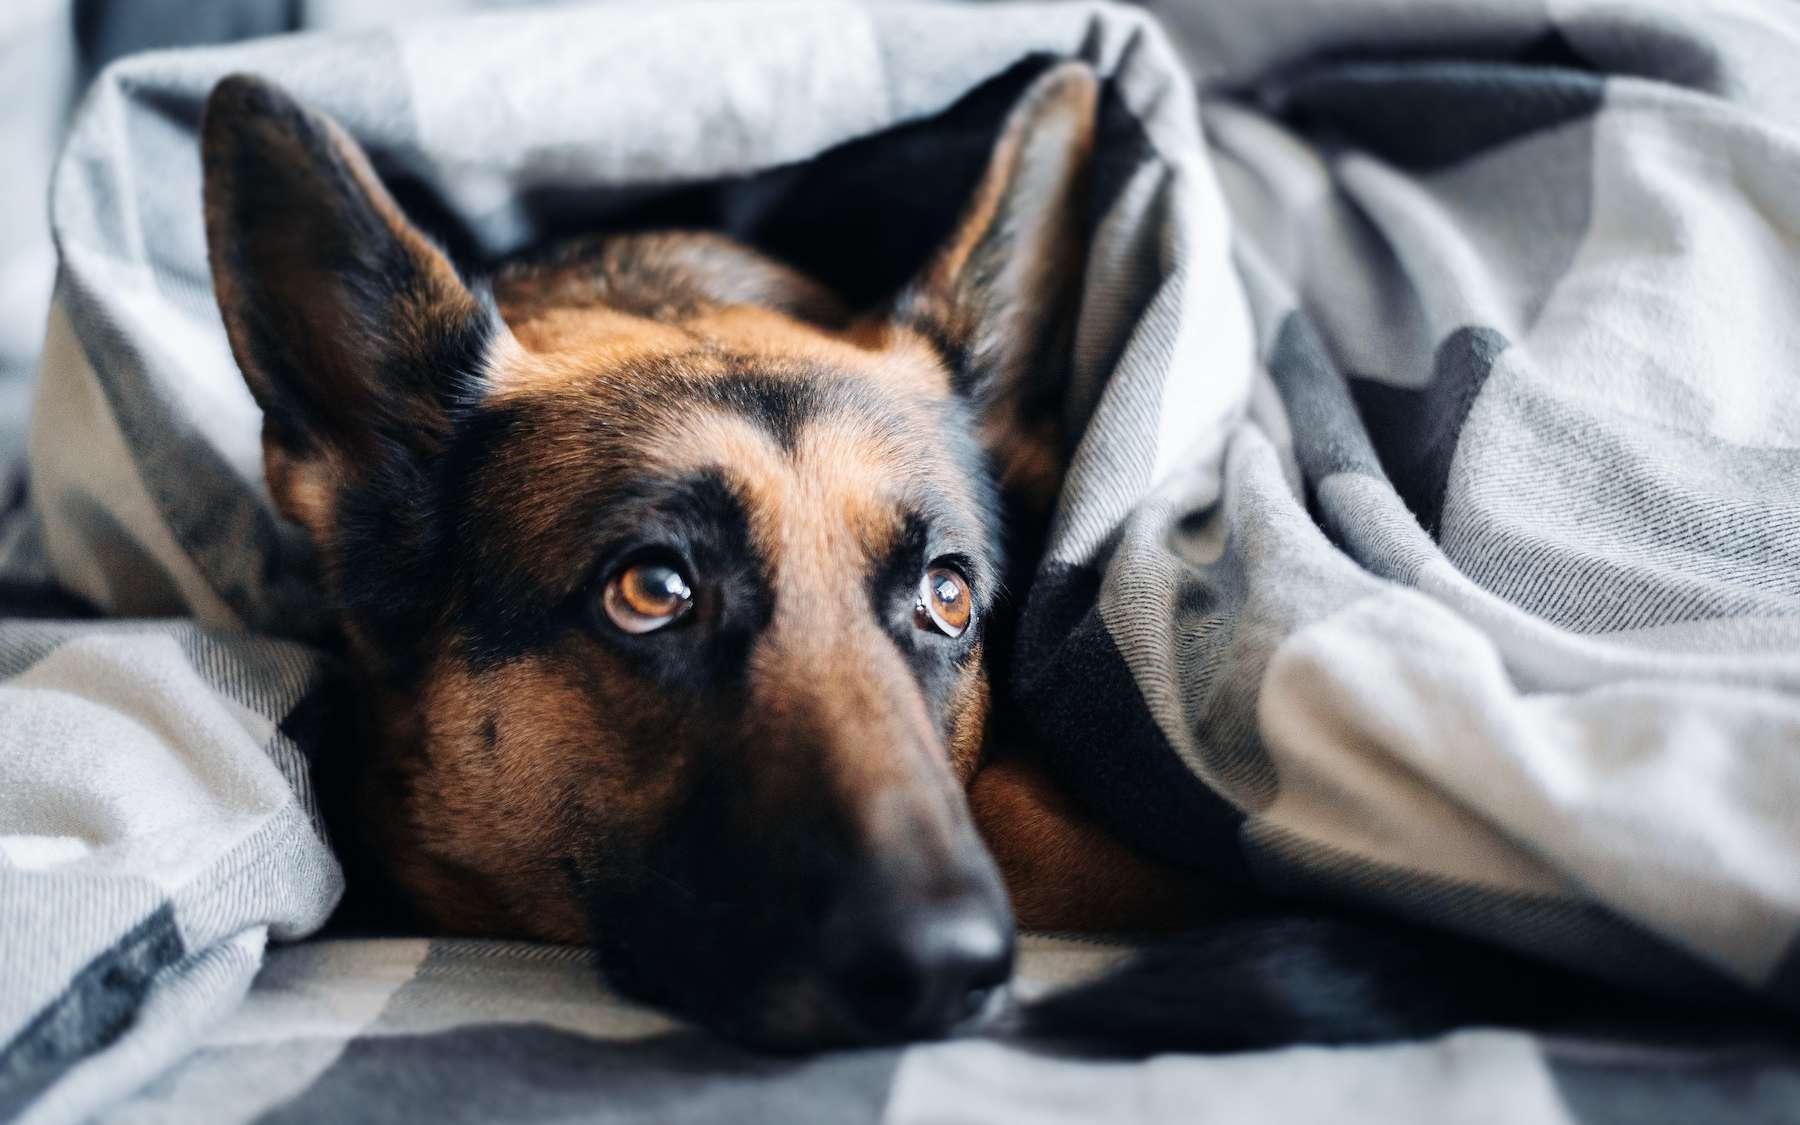 Un coronavirus canin capable d'infecter l'Homme. © Ivan Kuznetsov, Unsplash